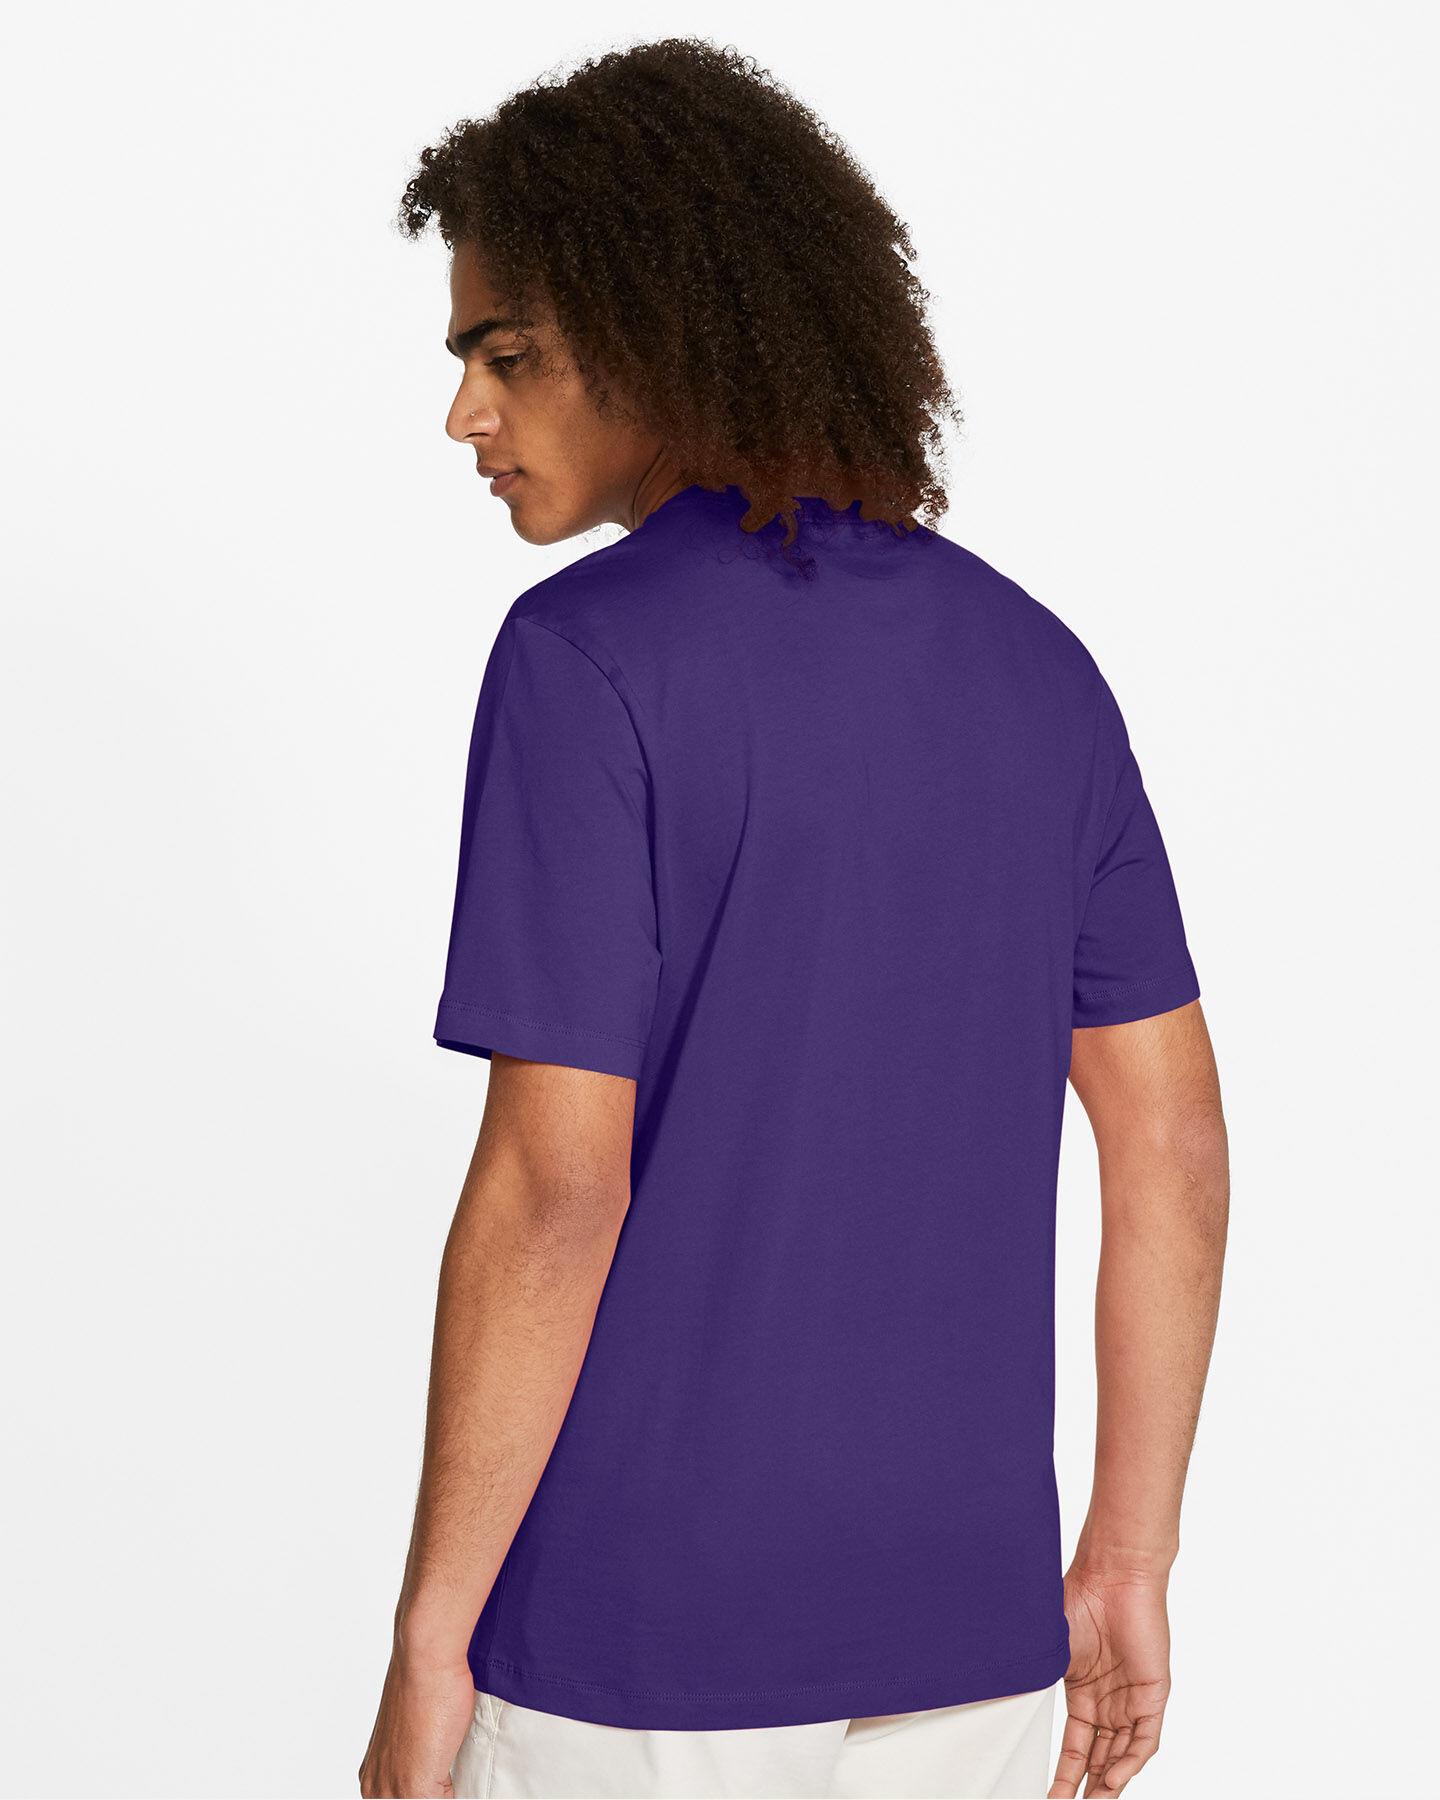 T-Shirt NIKE JORDAN JUMPMAN MOUNTAINSIDE M S5247340 scatto 3